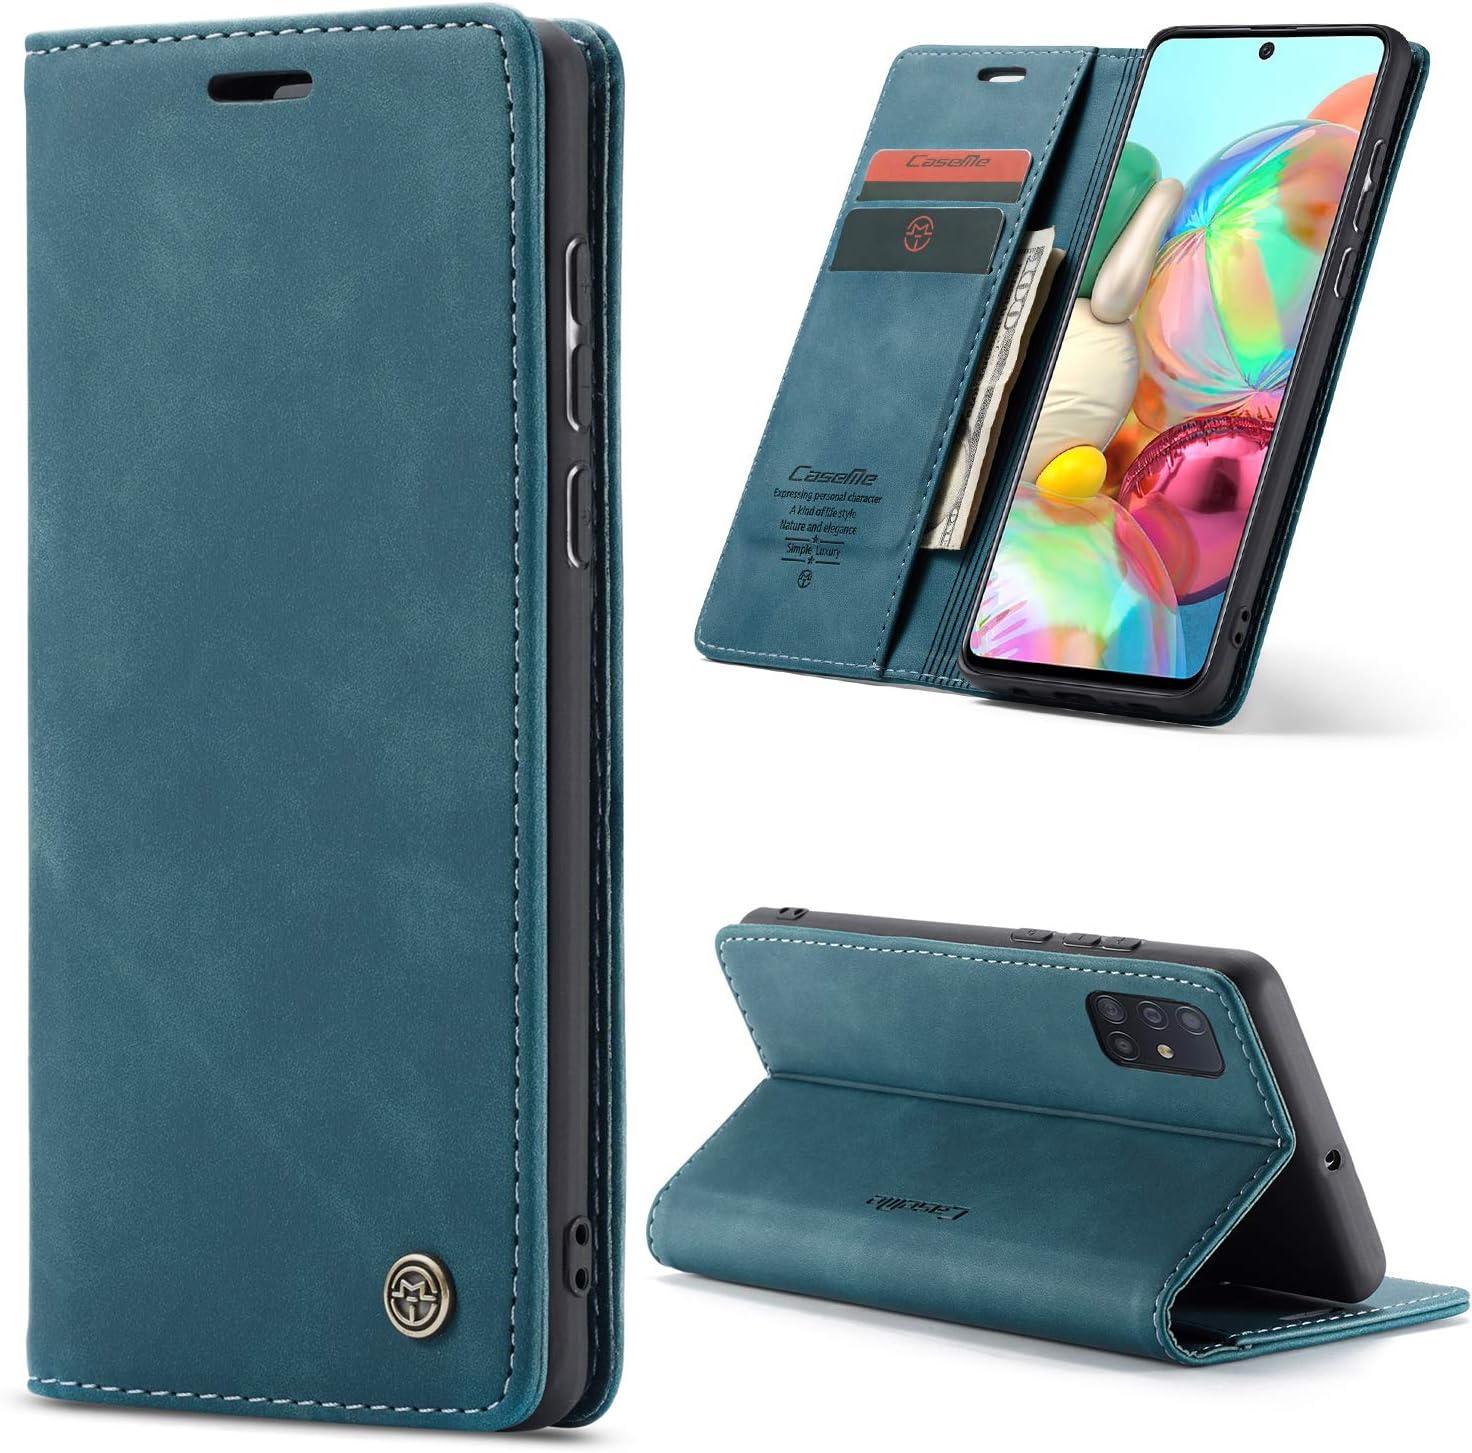 Funda Estilo Billetera Flip Cover azul para Samsung A31